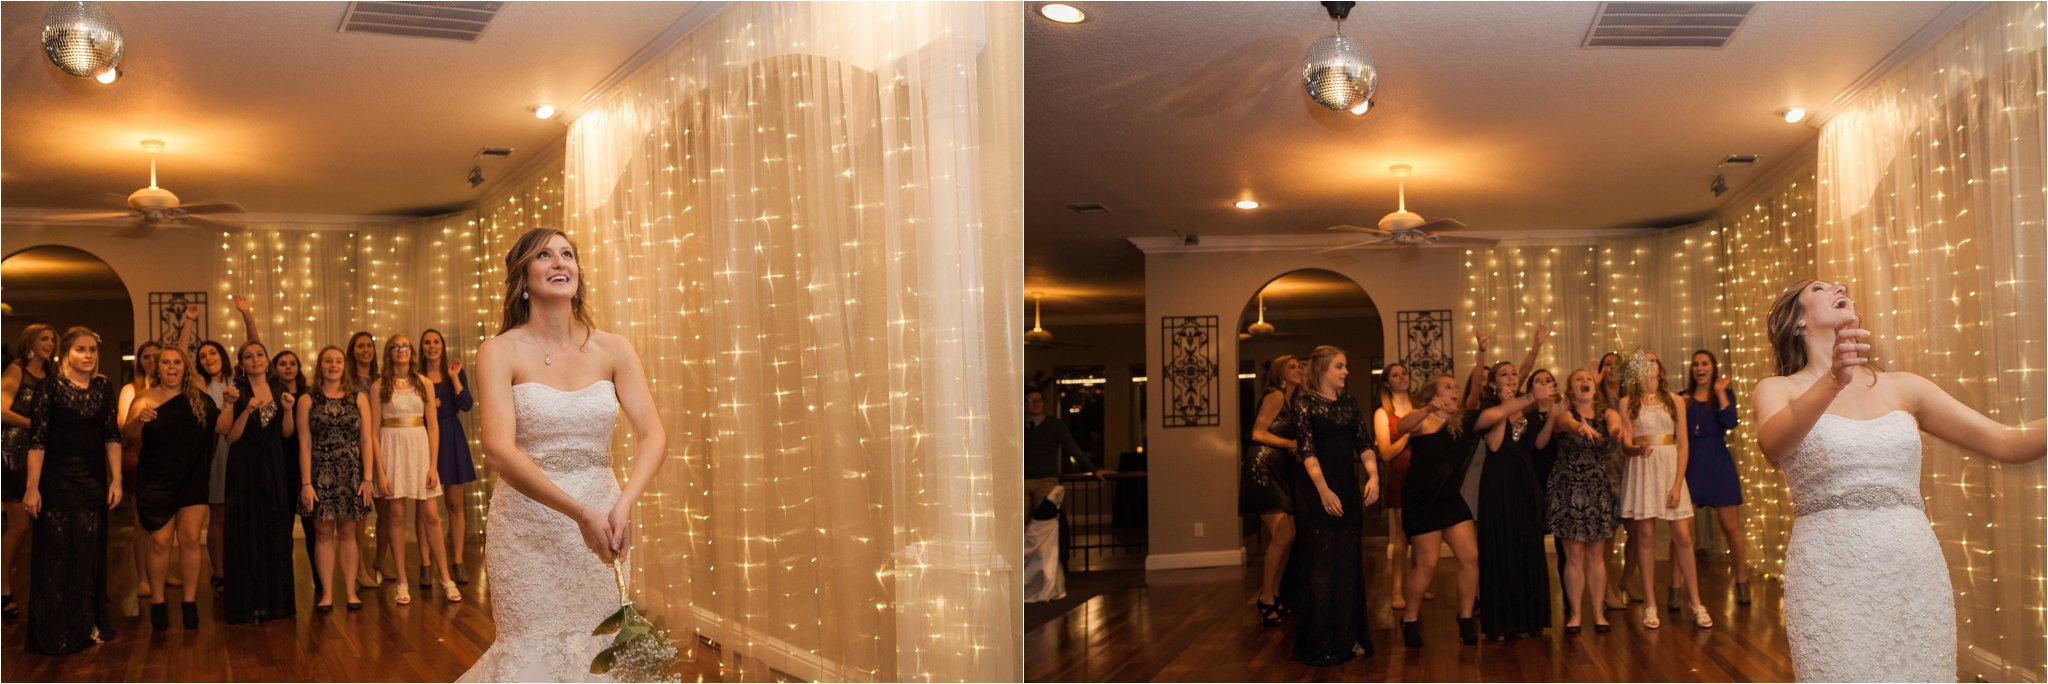 lunsford-wedding-1103.jpg